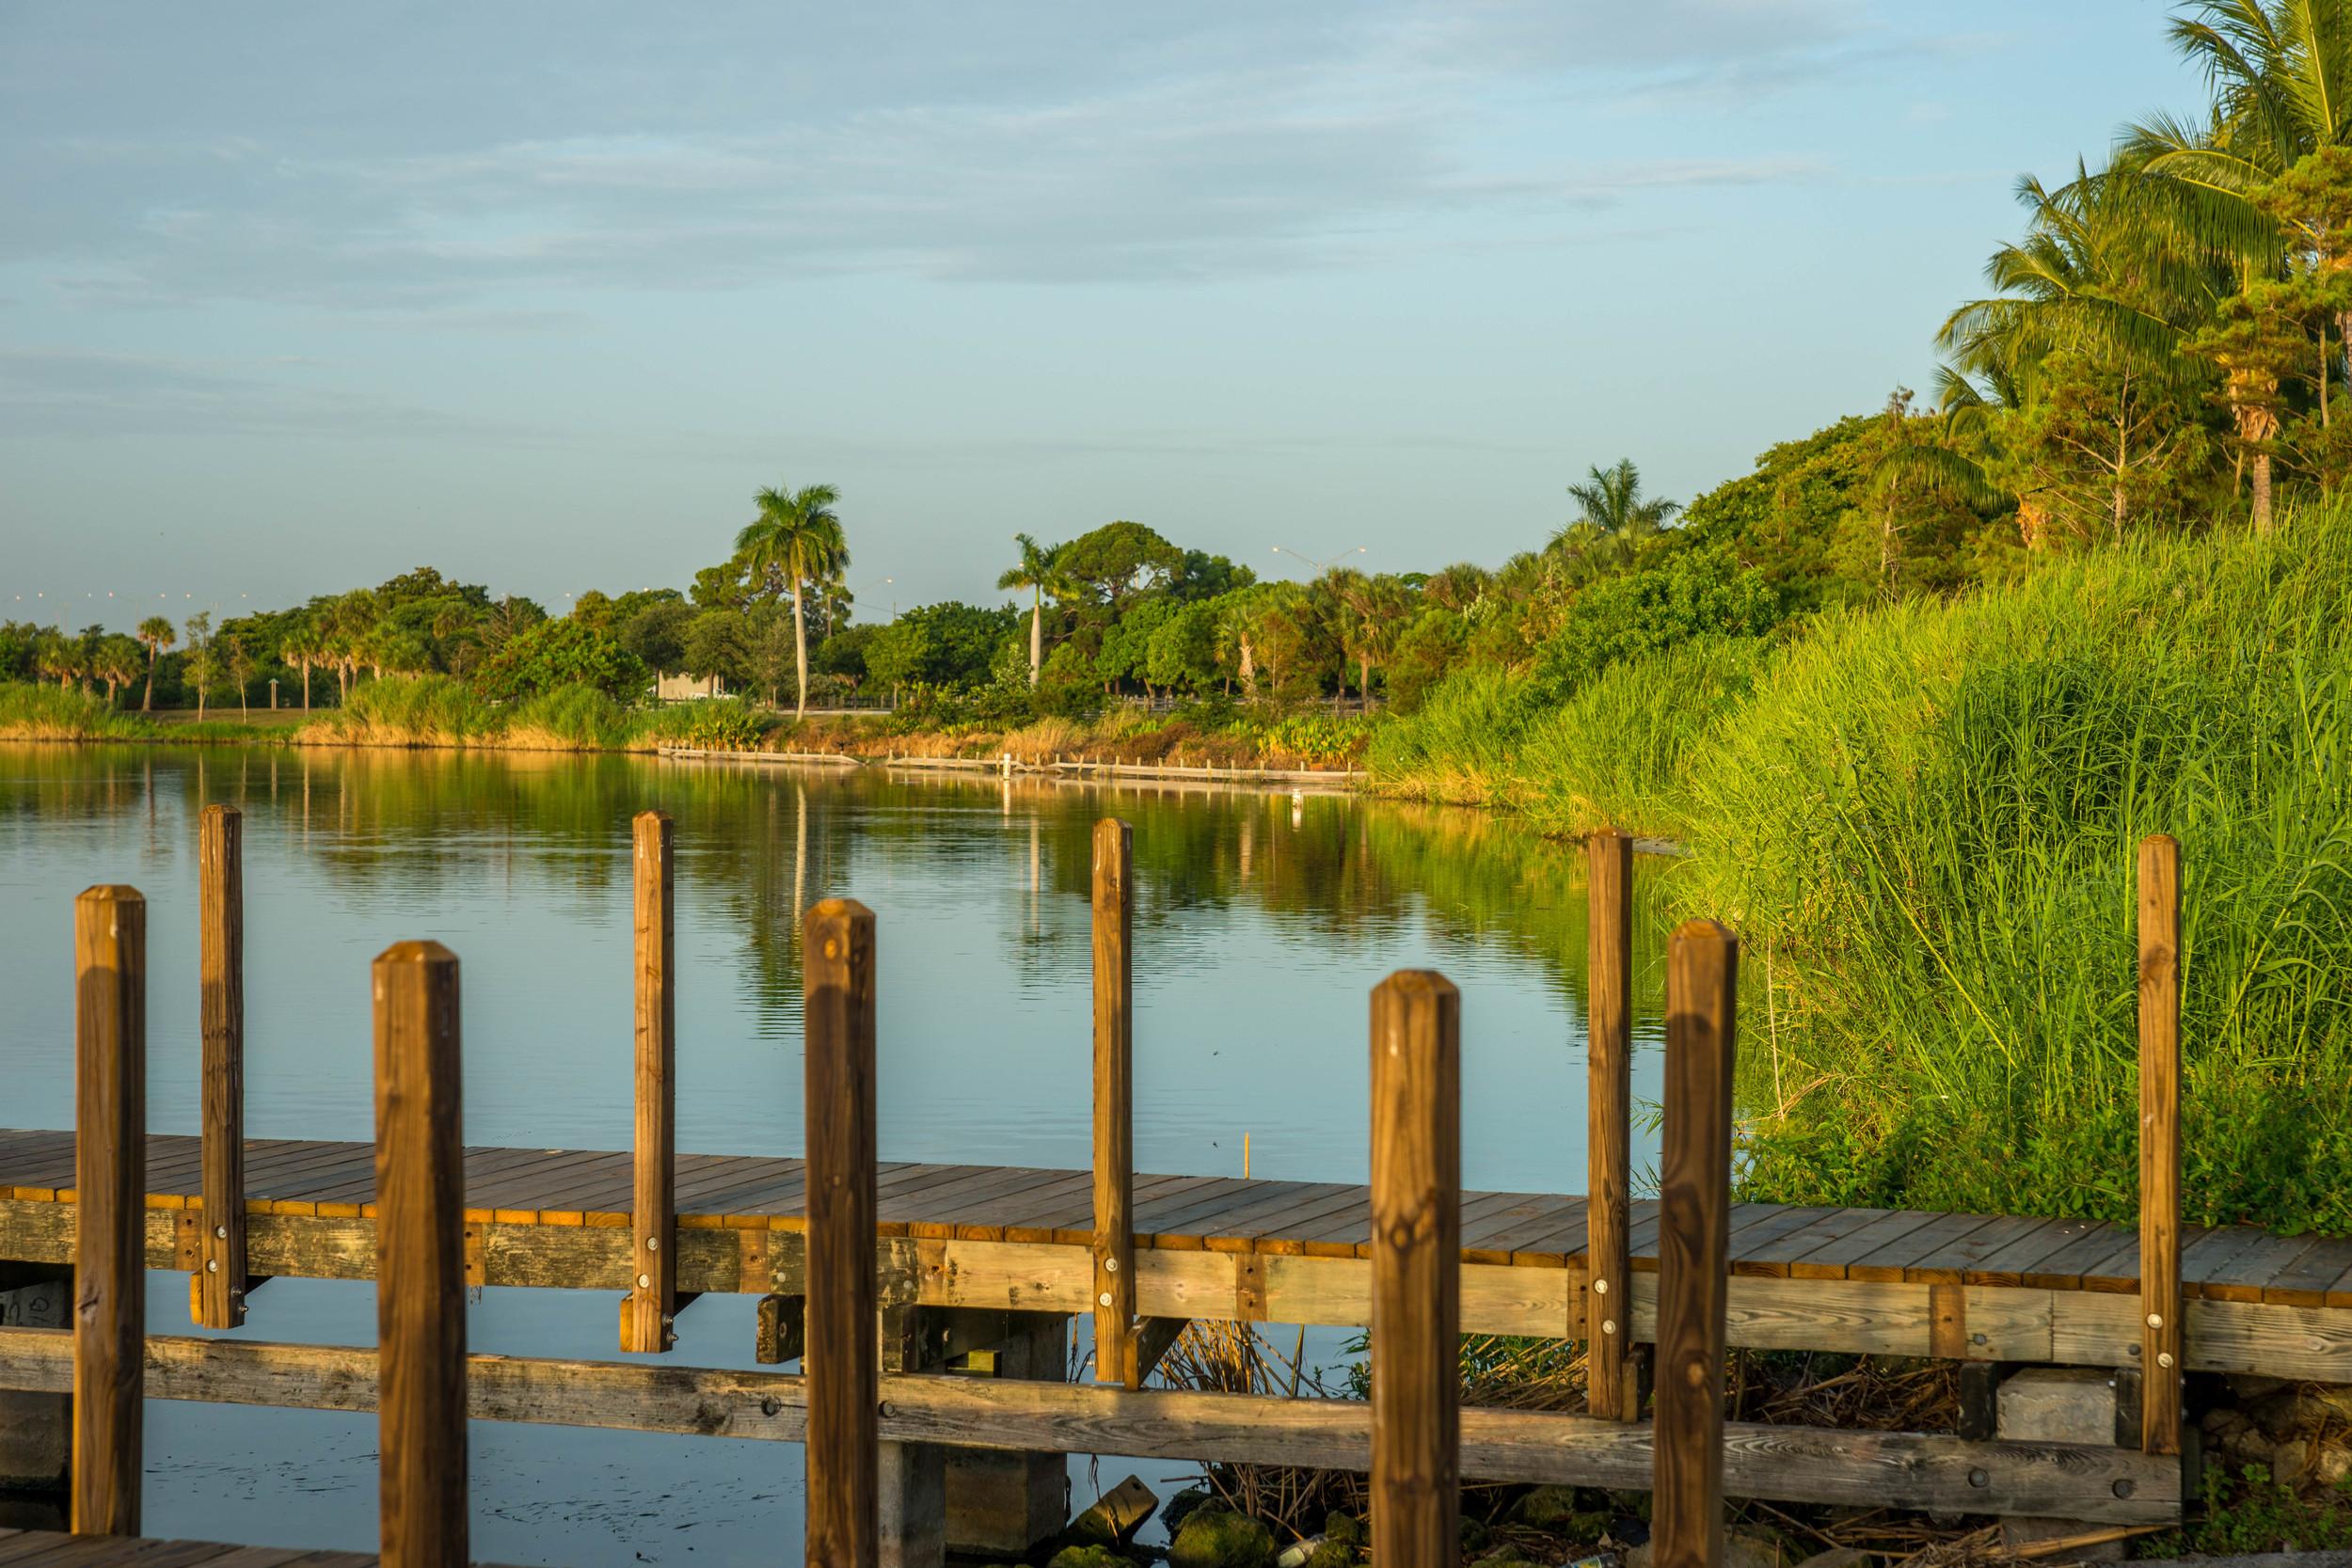 Florida Fishing June 2015-149.jpg